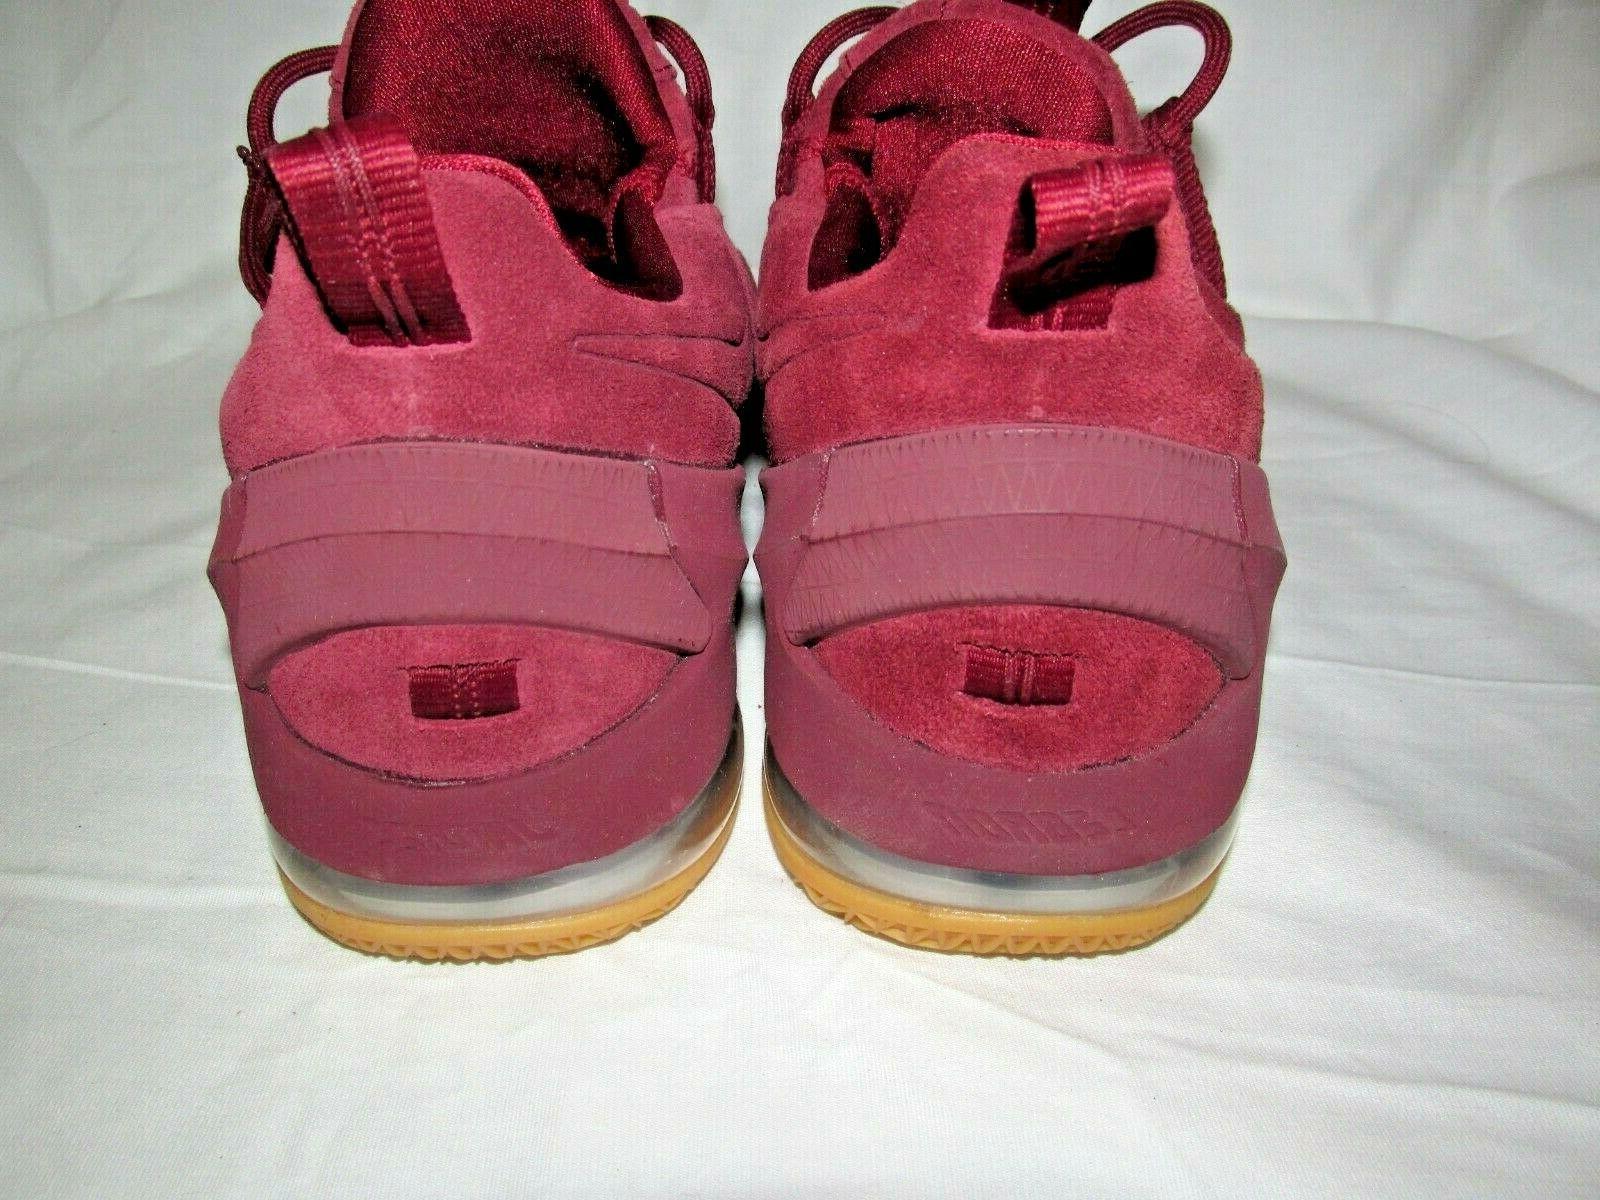 Nike PRM Basketball Shoes 10 Team AH8289-600